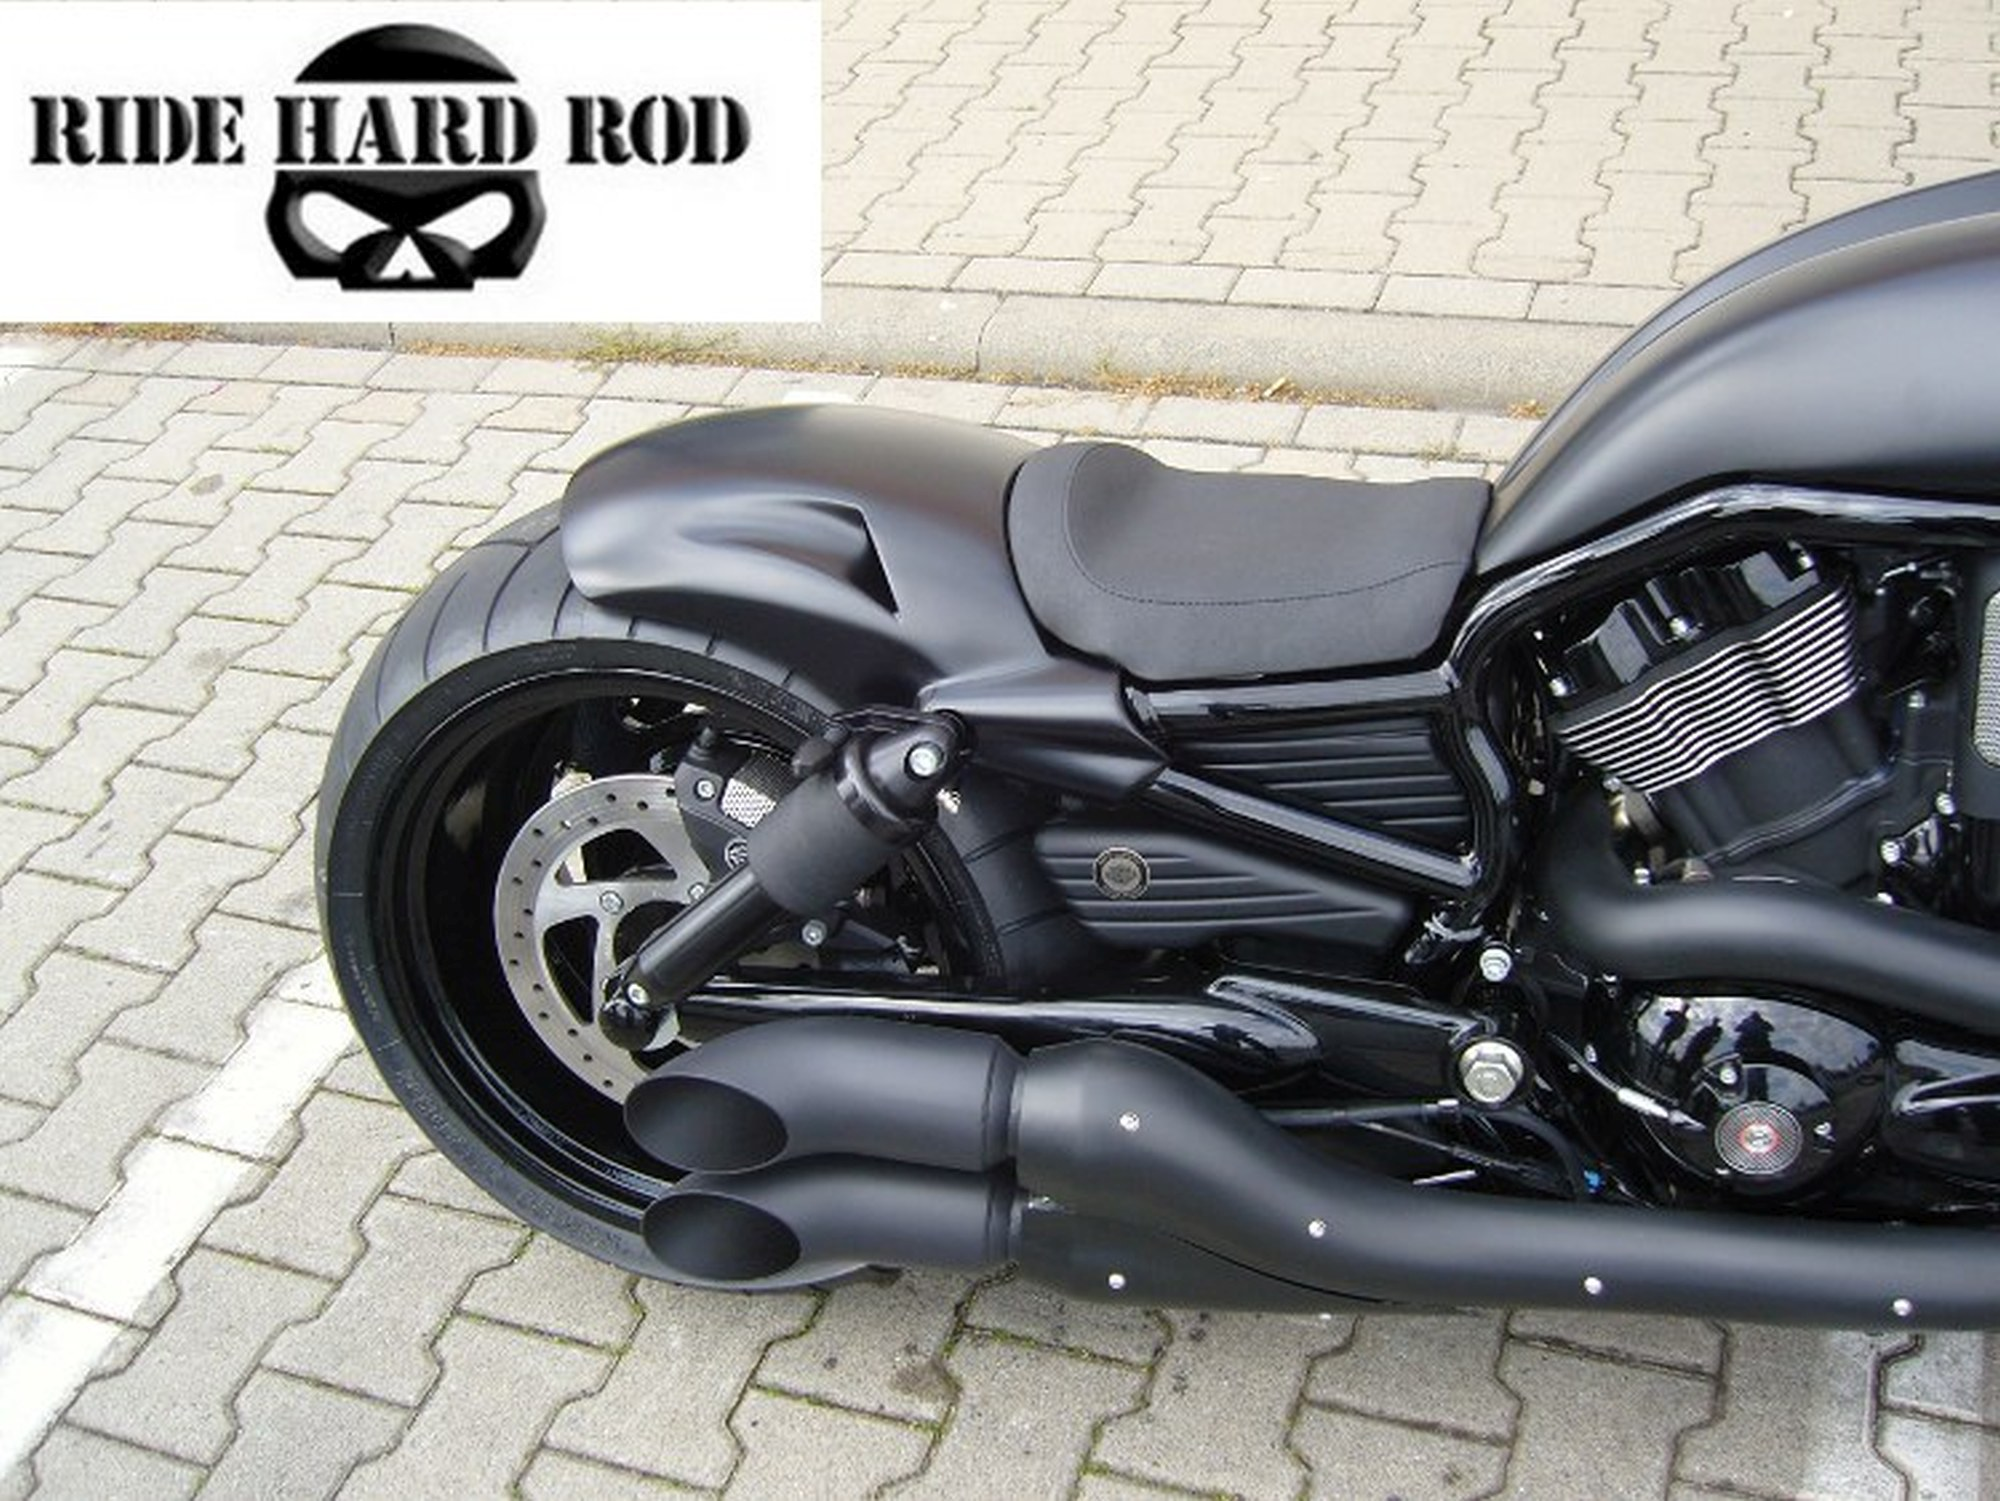 Rear Fender Flat For 280 X 10 5 Tire Tuv Ride Hard Rod